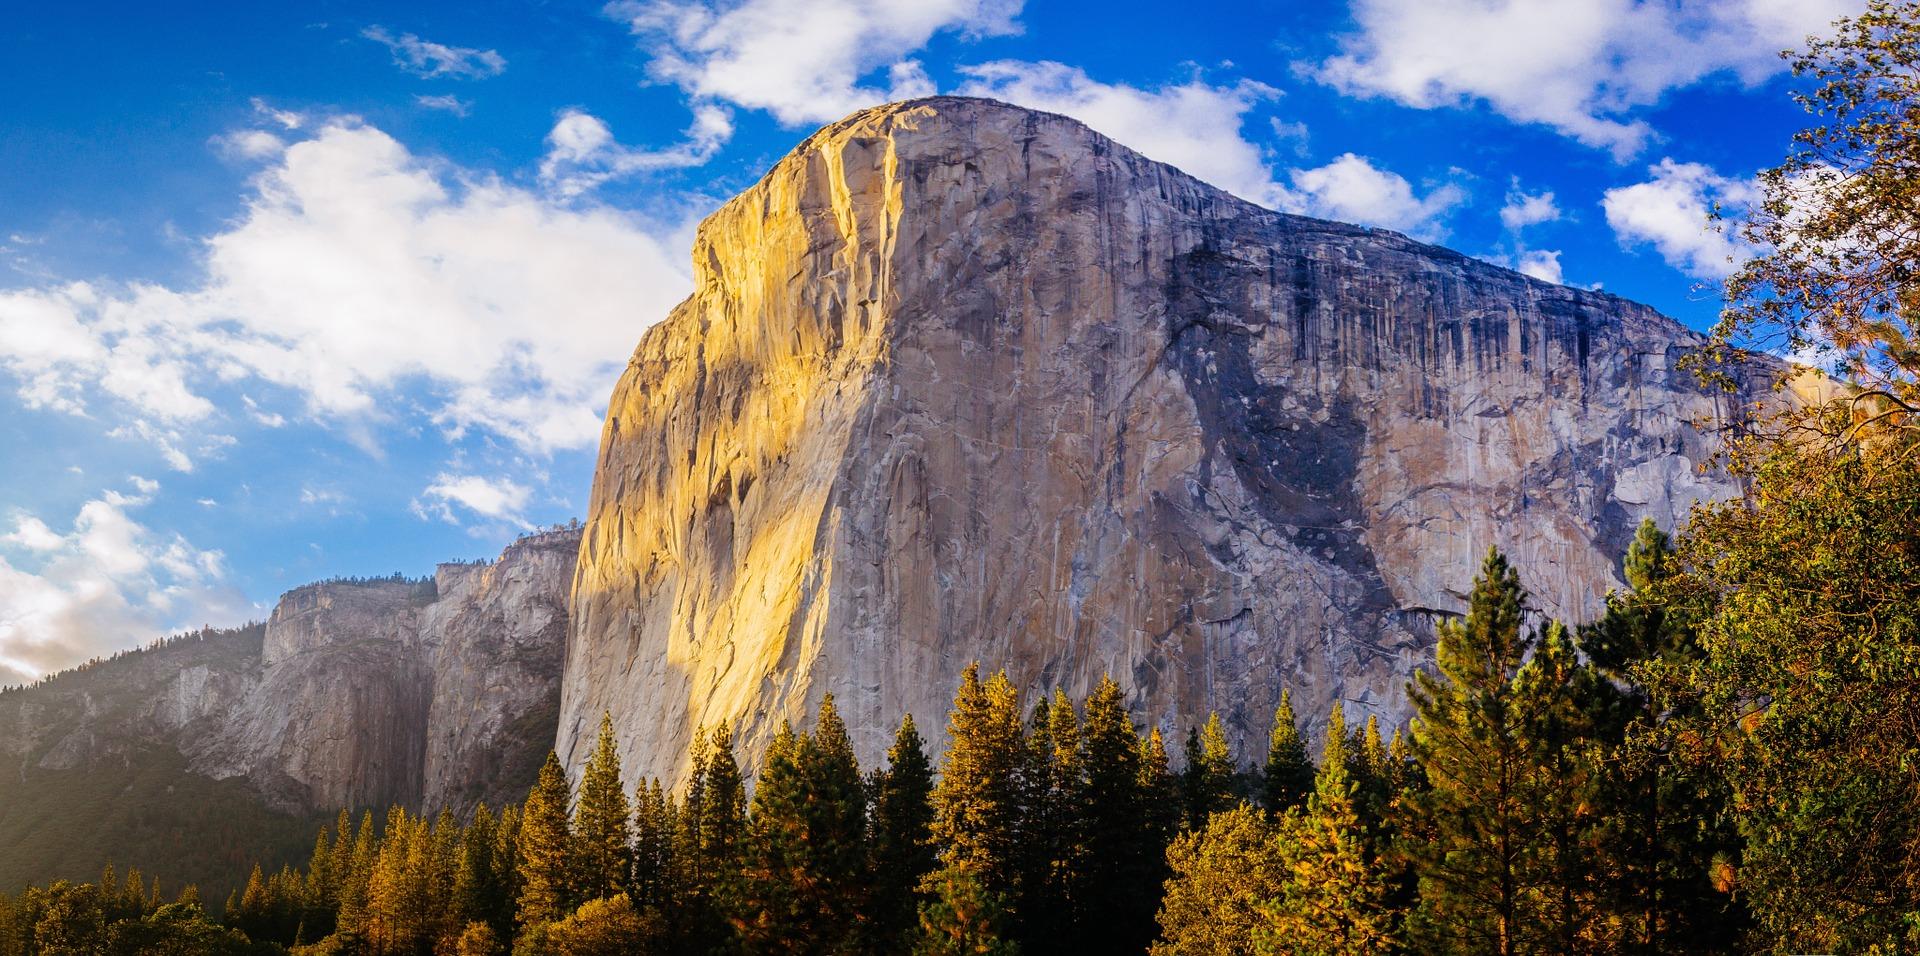 Rocky Mountains (Yosemite Valley)